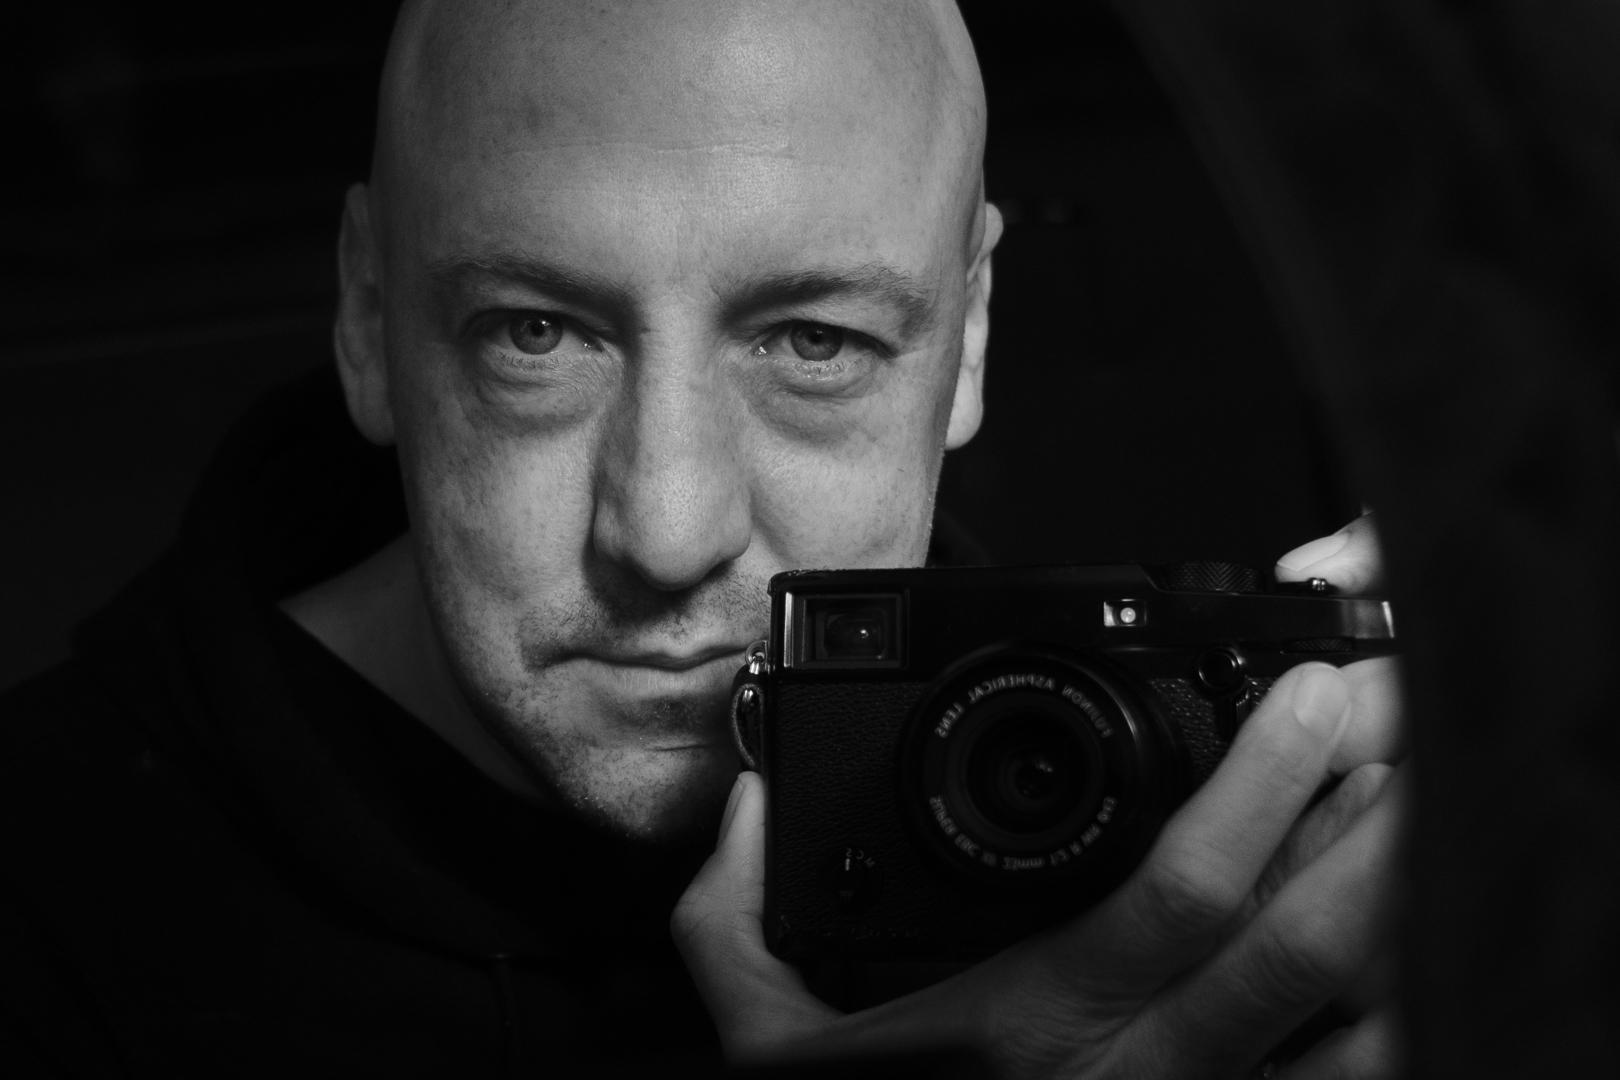 TIM MOOLMAN - Website: www.timmoolmanphoto.comInstagram: @timmoolmanweddings / @timmoolmanphotoFacebook Page: @TimMoolmanPhotography